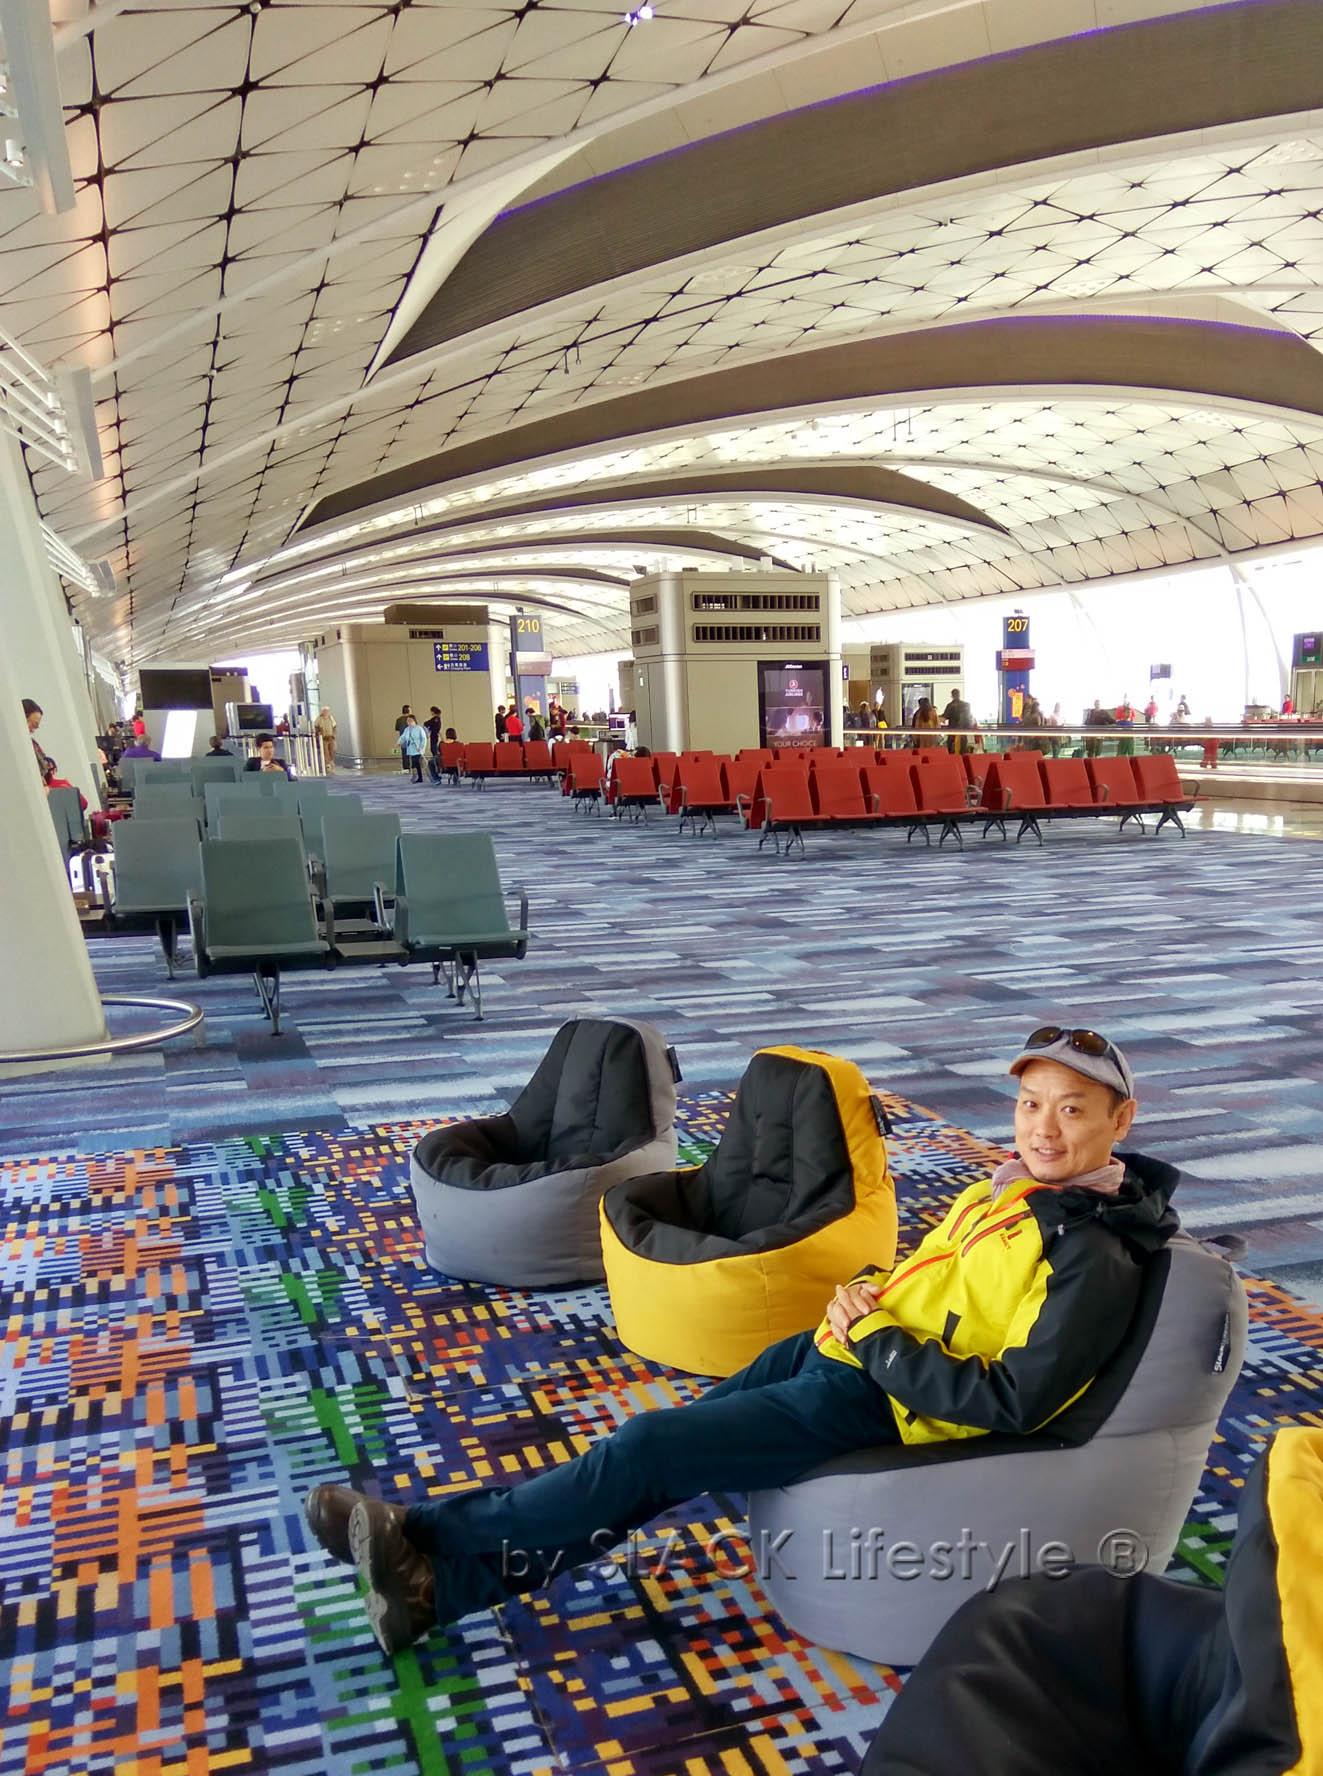 Sirocco – HK International Airport – Concourse Kids Corners